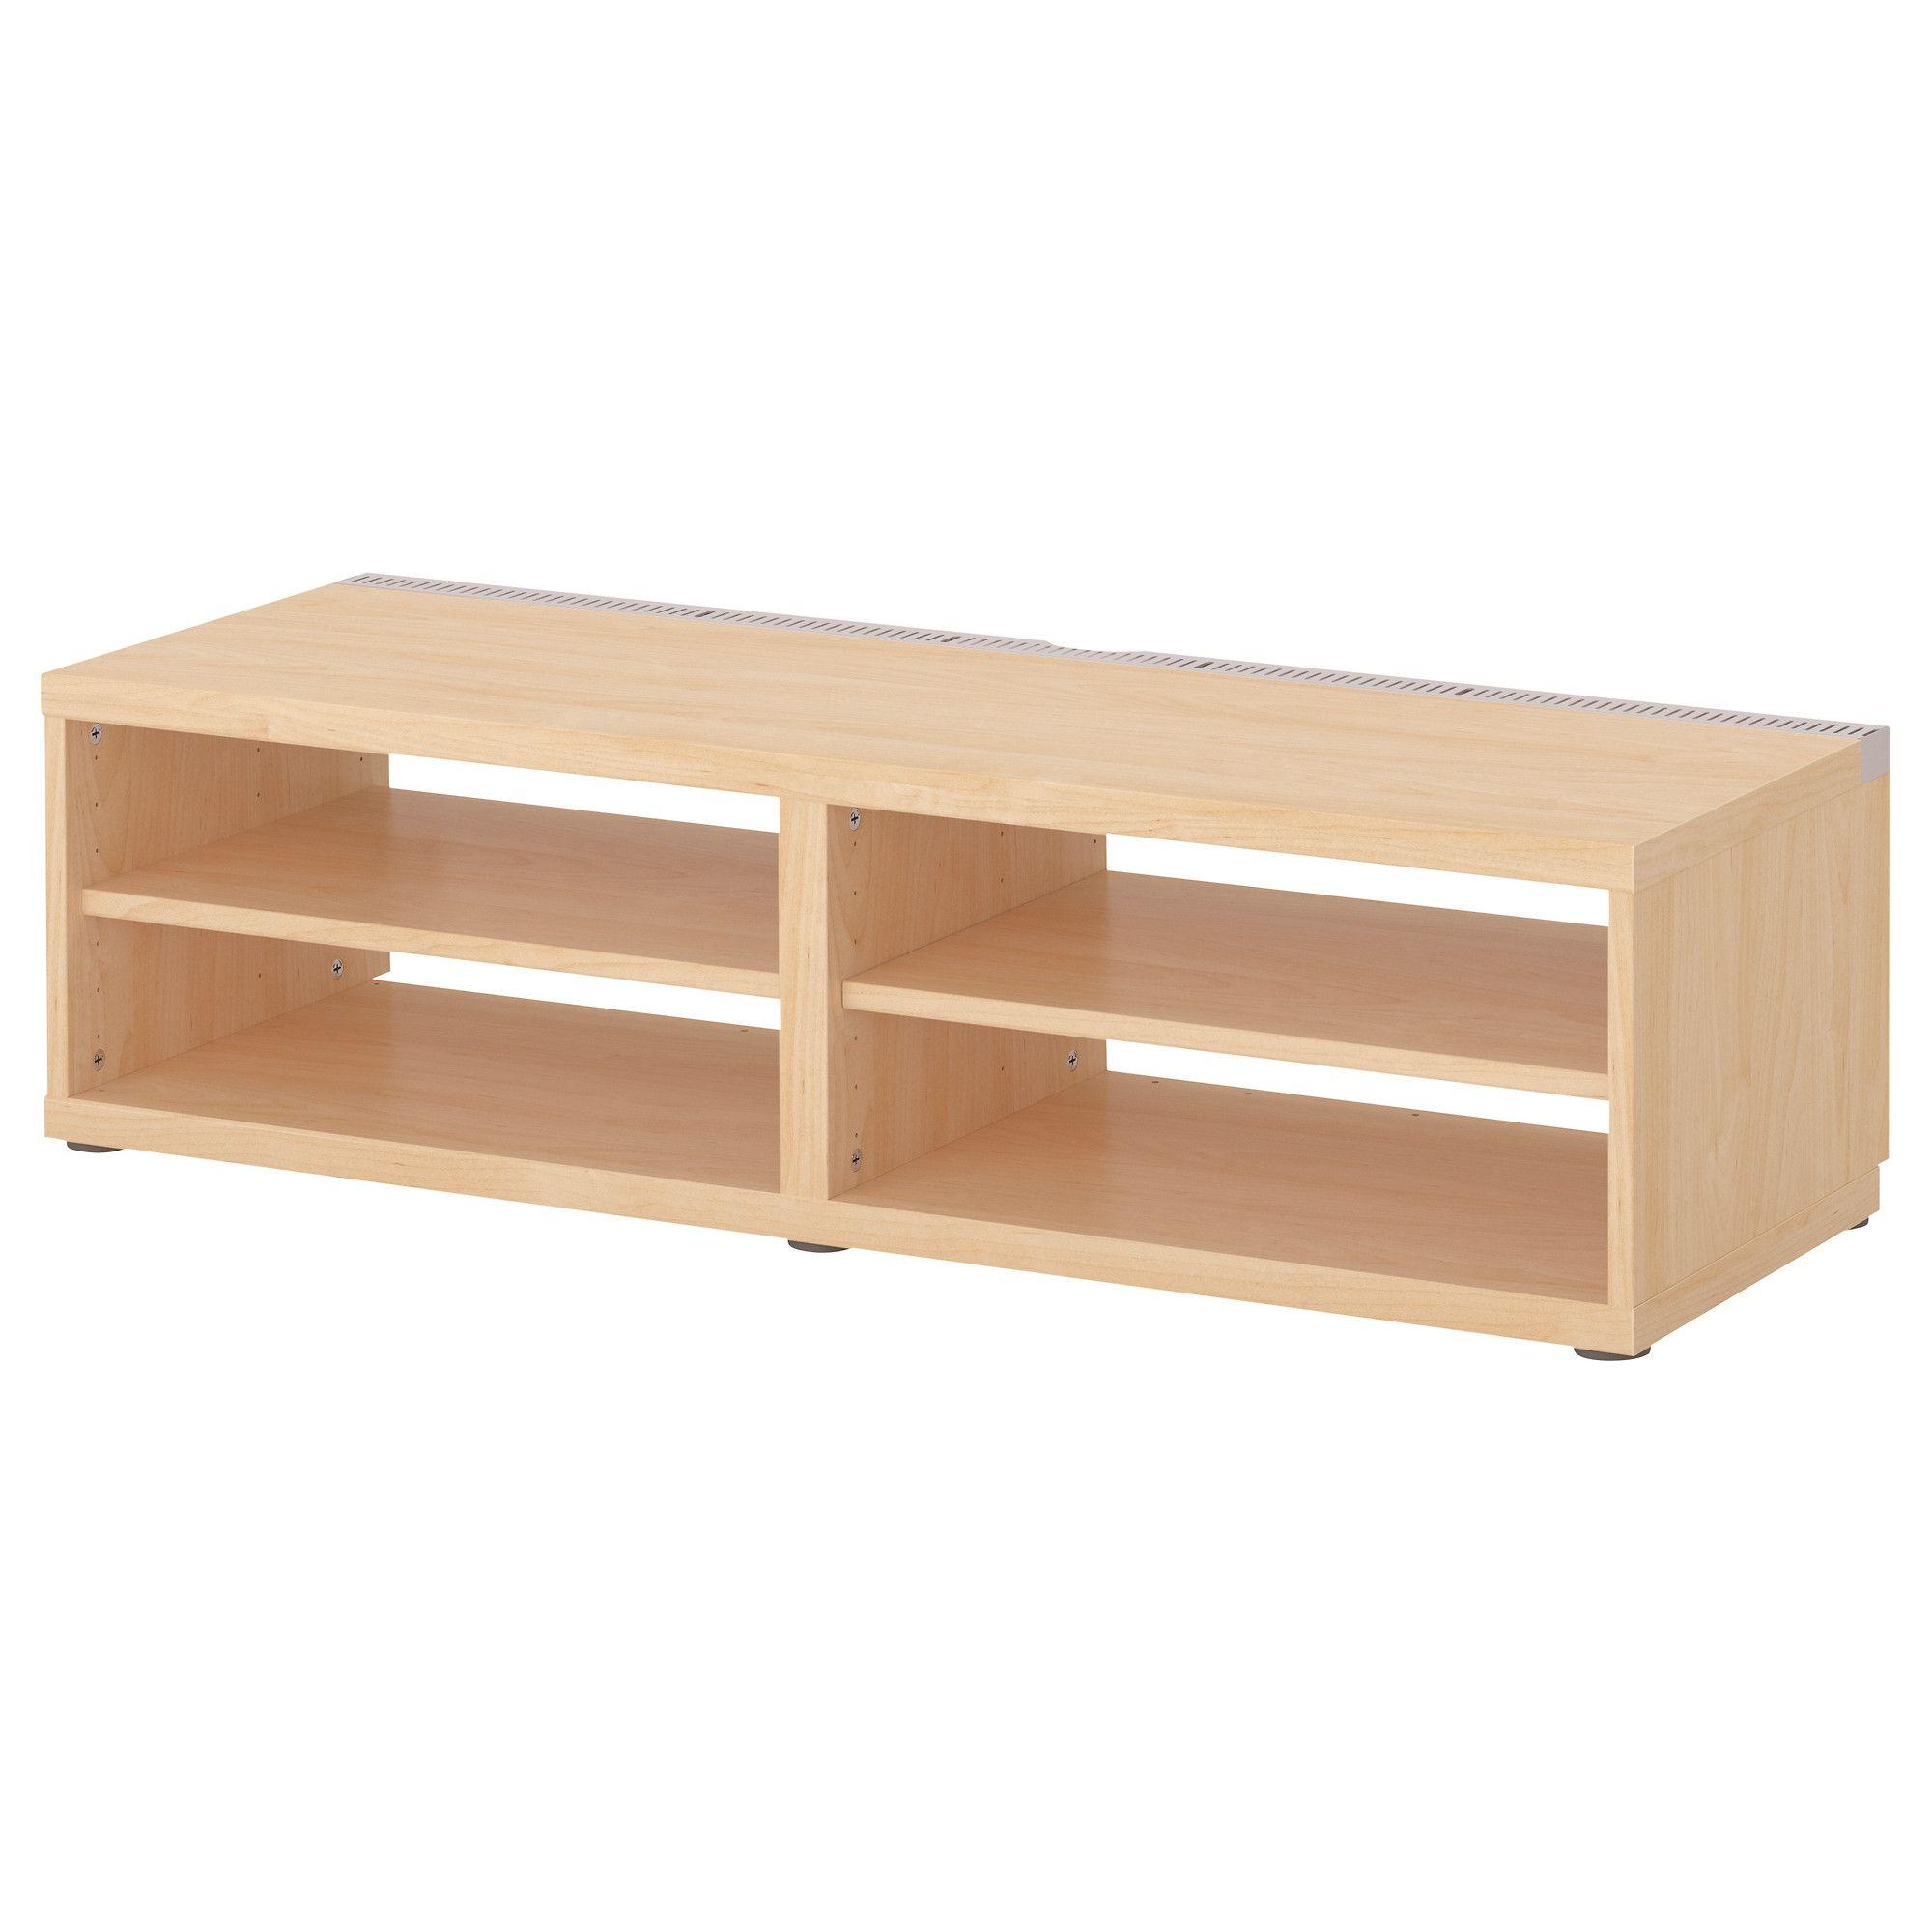 Ikea Us Furniture And Home Furnishings Tv Cabinet Ikea Ikea